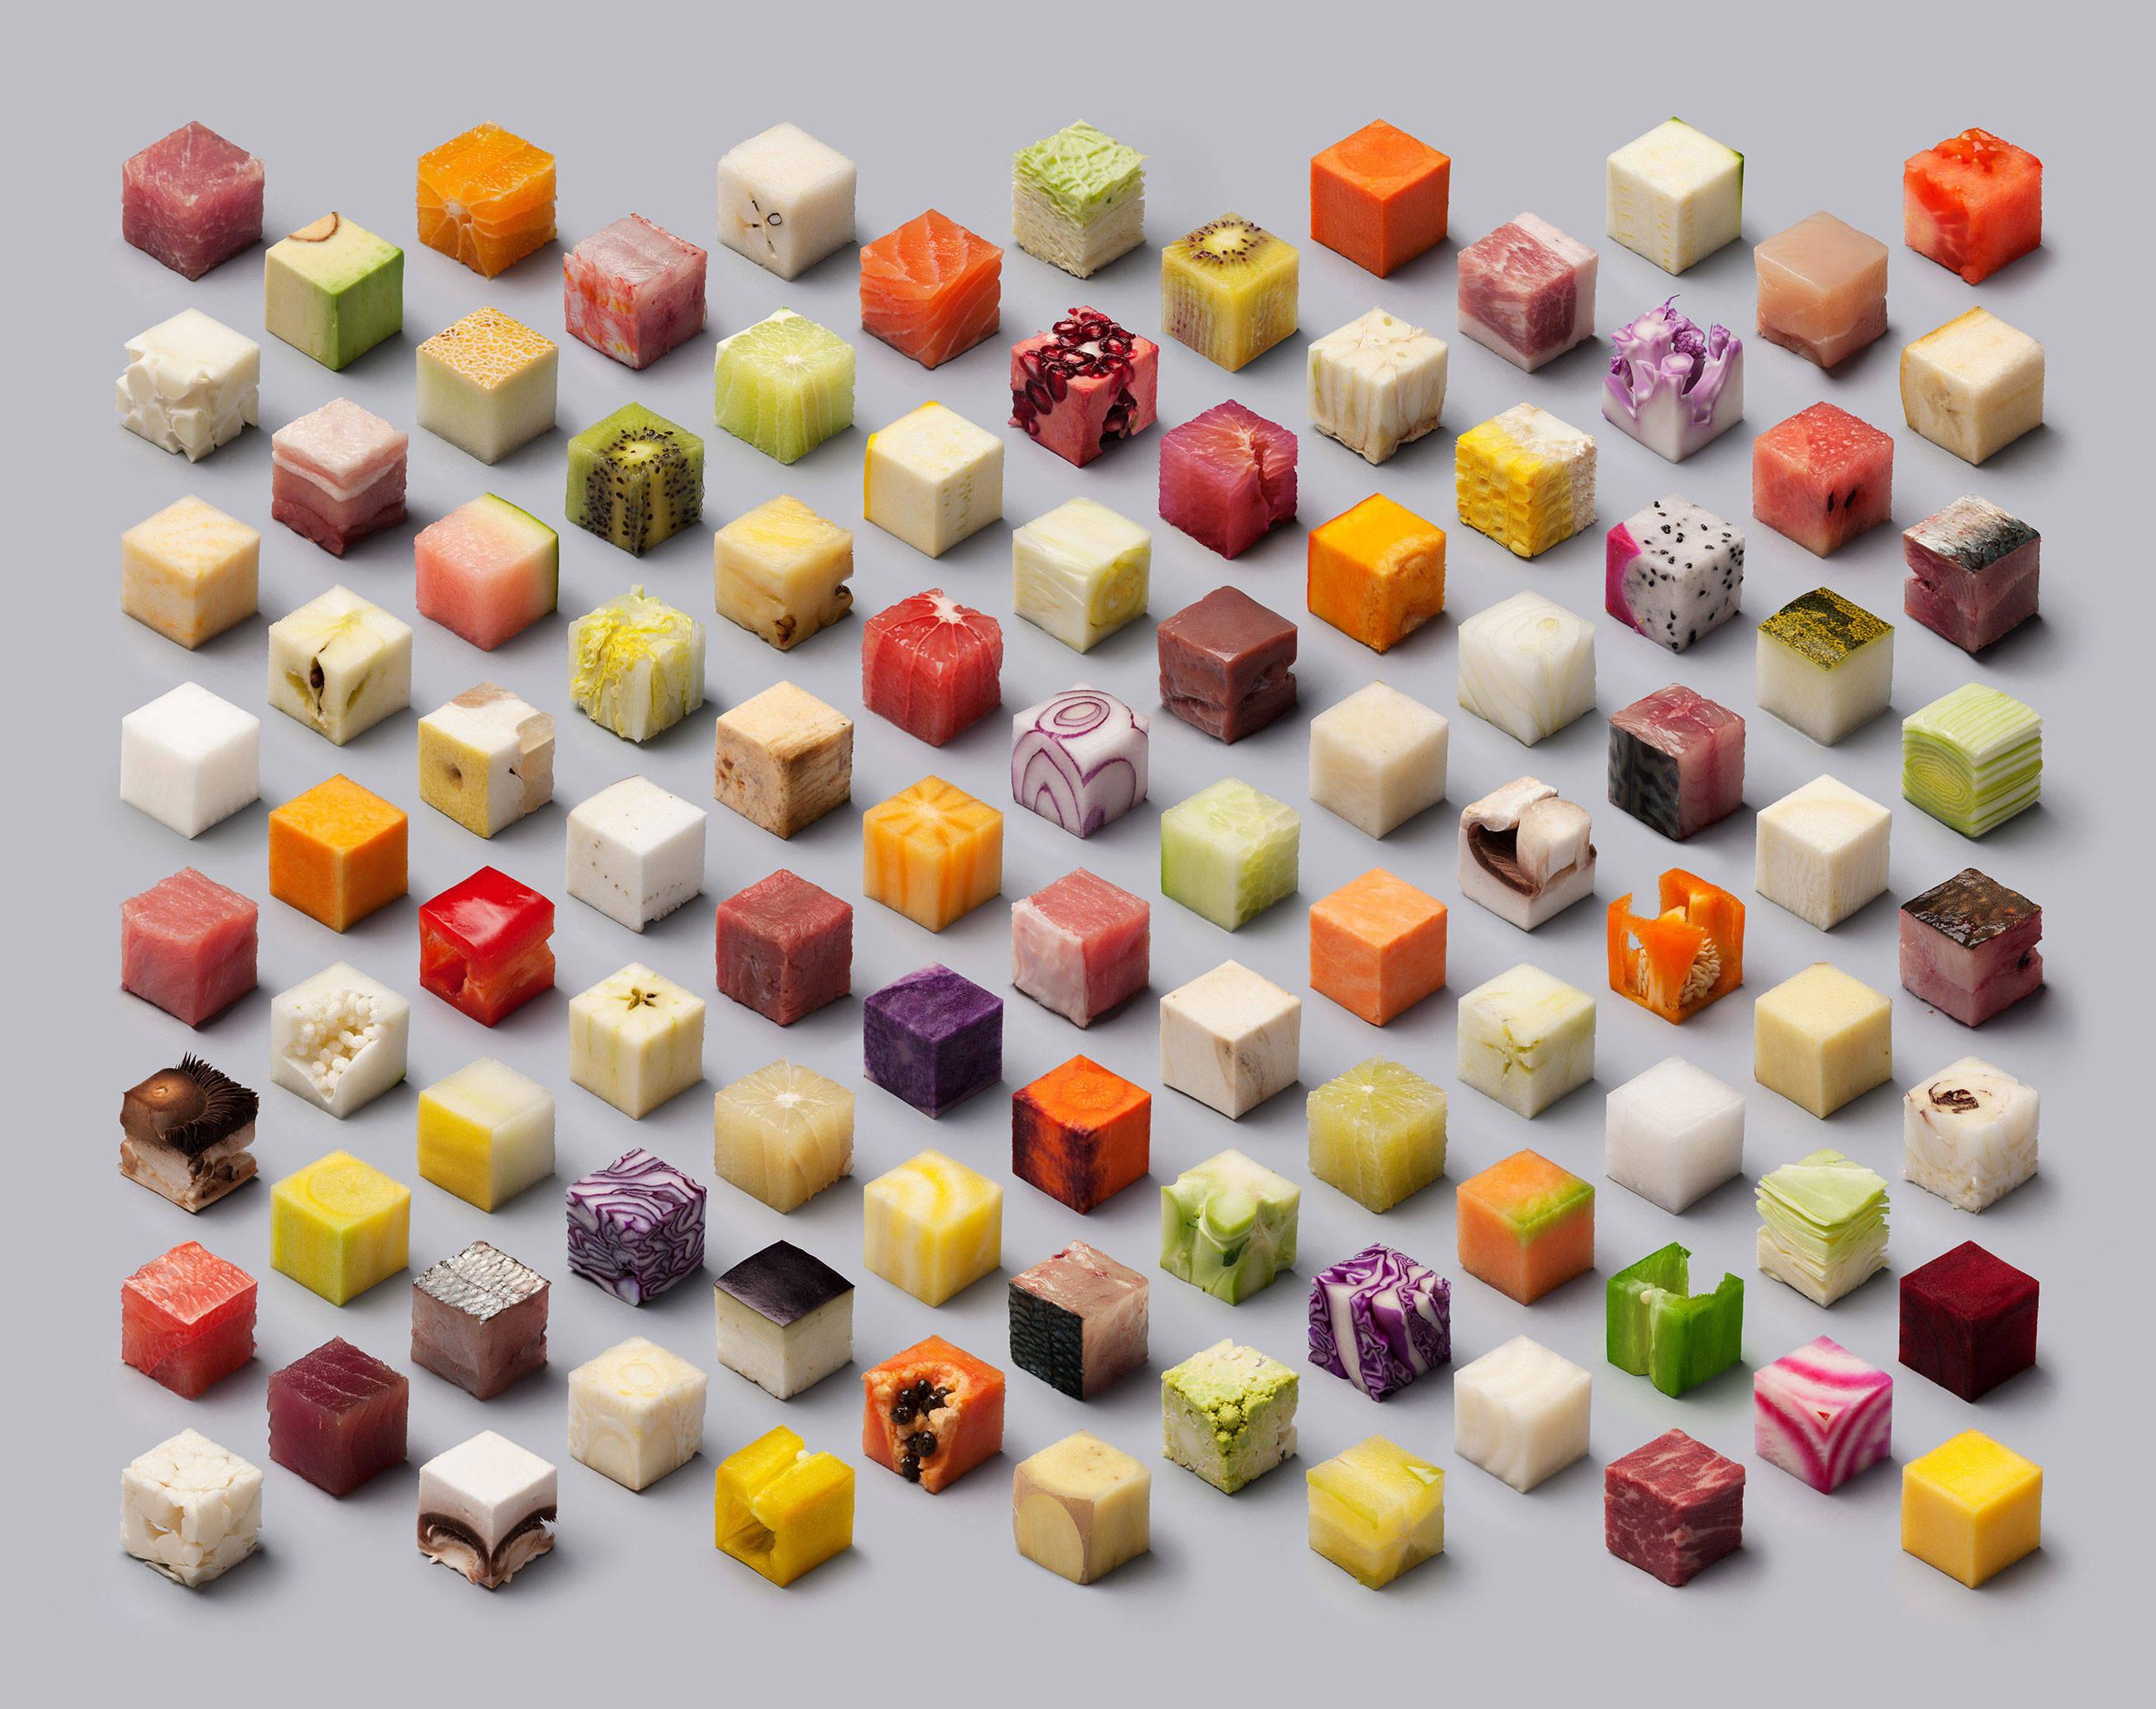 cubeofood